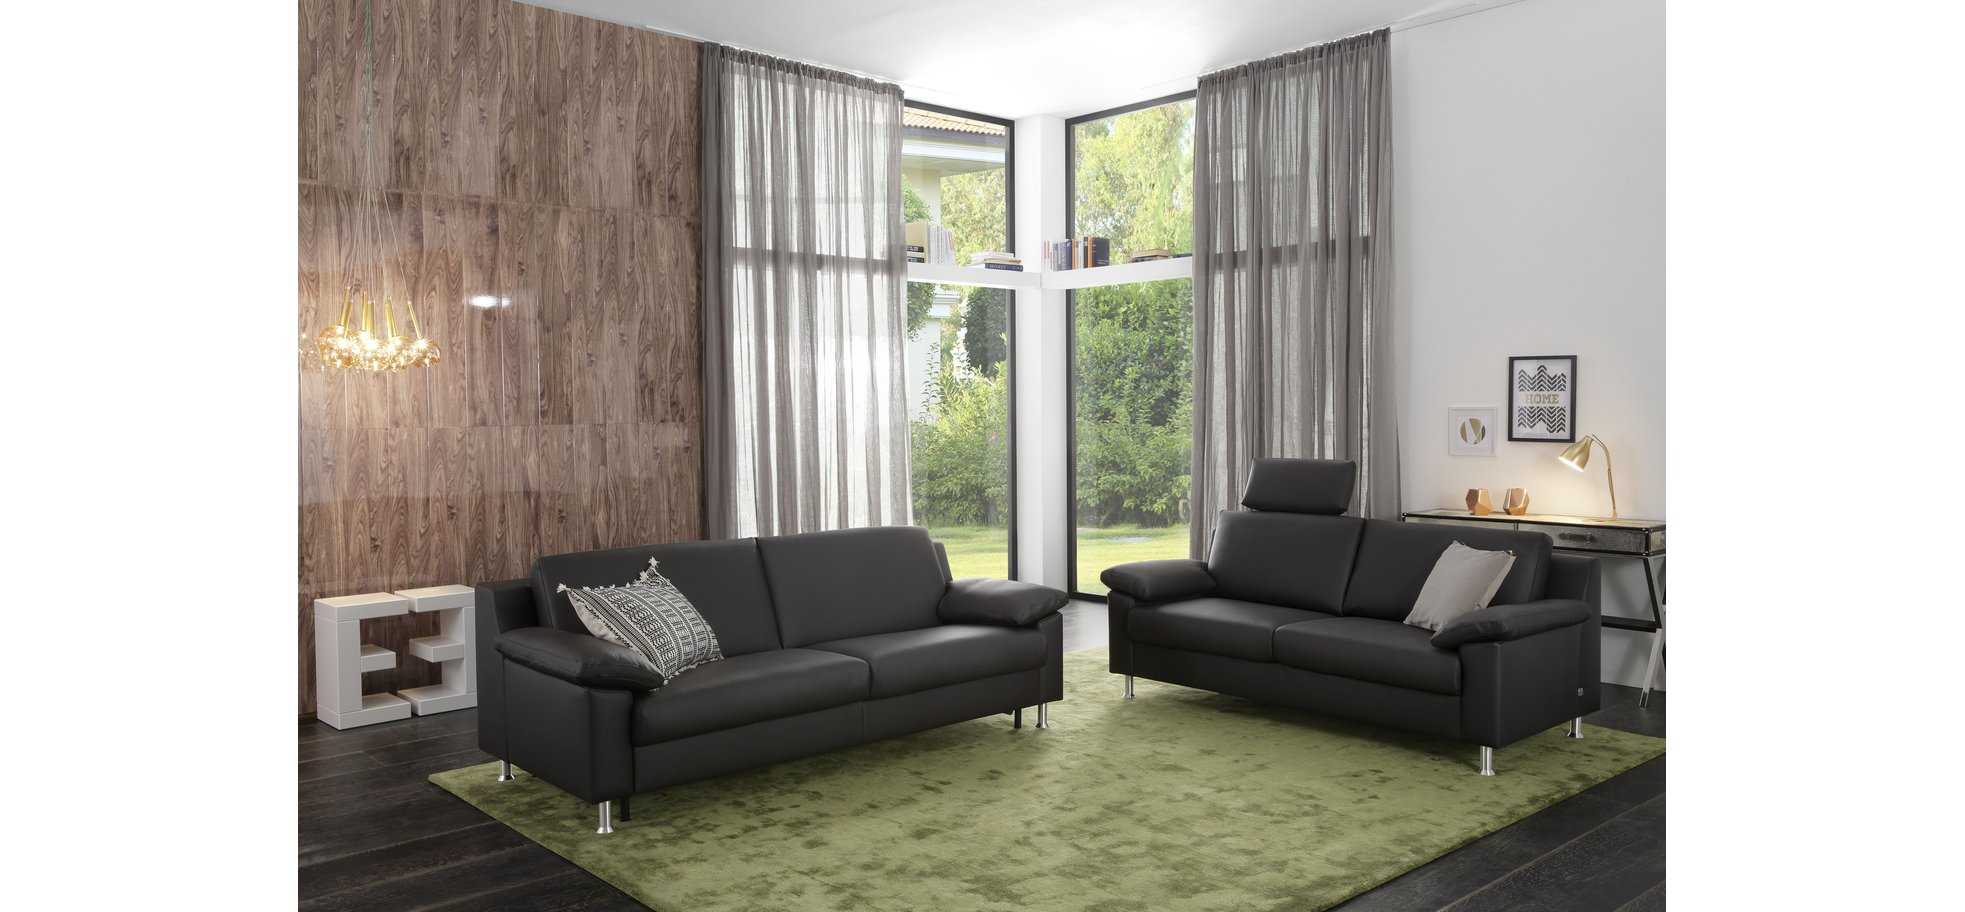 ledersofa in dunkelbraun m belhaus pohl wilhelmshaven friesland m belhaus pohl gmbh. Black Bedroom Furniture Sets. Home Design Ideas